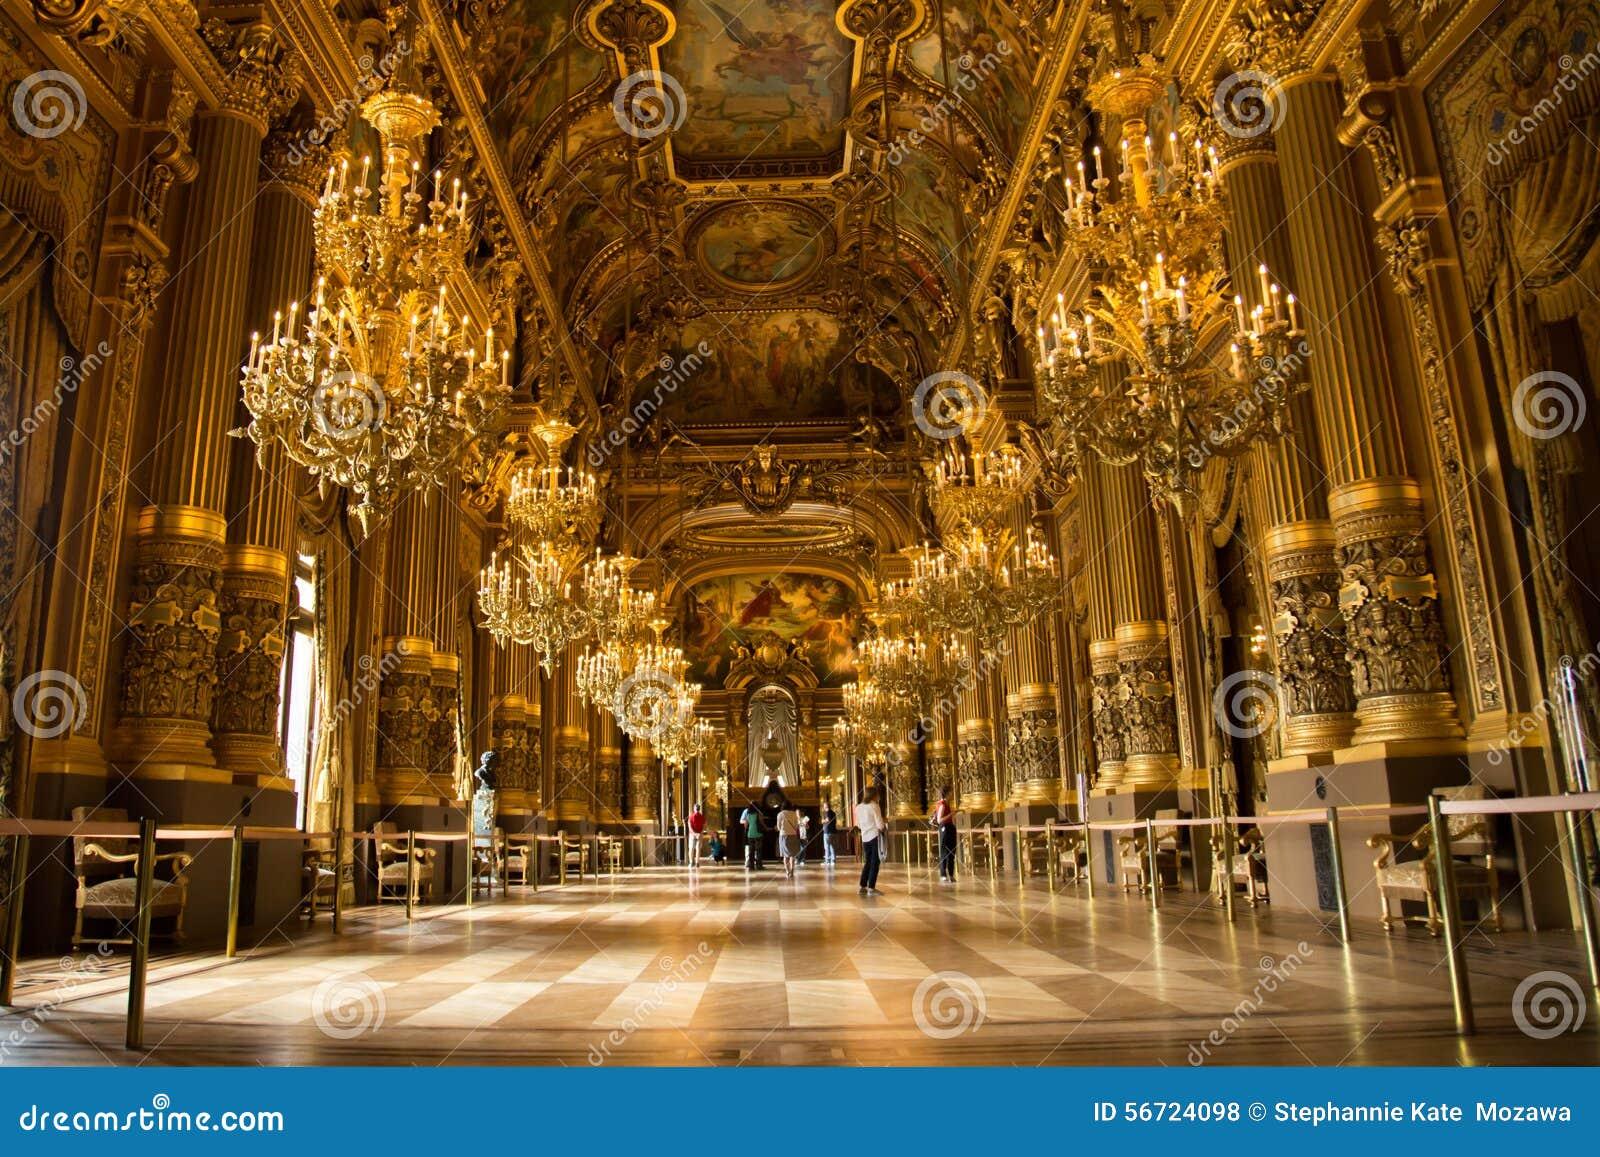 Paris Opera House Grand Foyer : Palais garnier interior grand foyer editorial stock photo